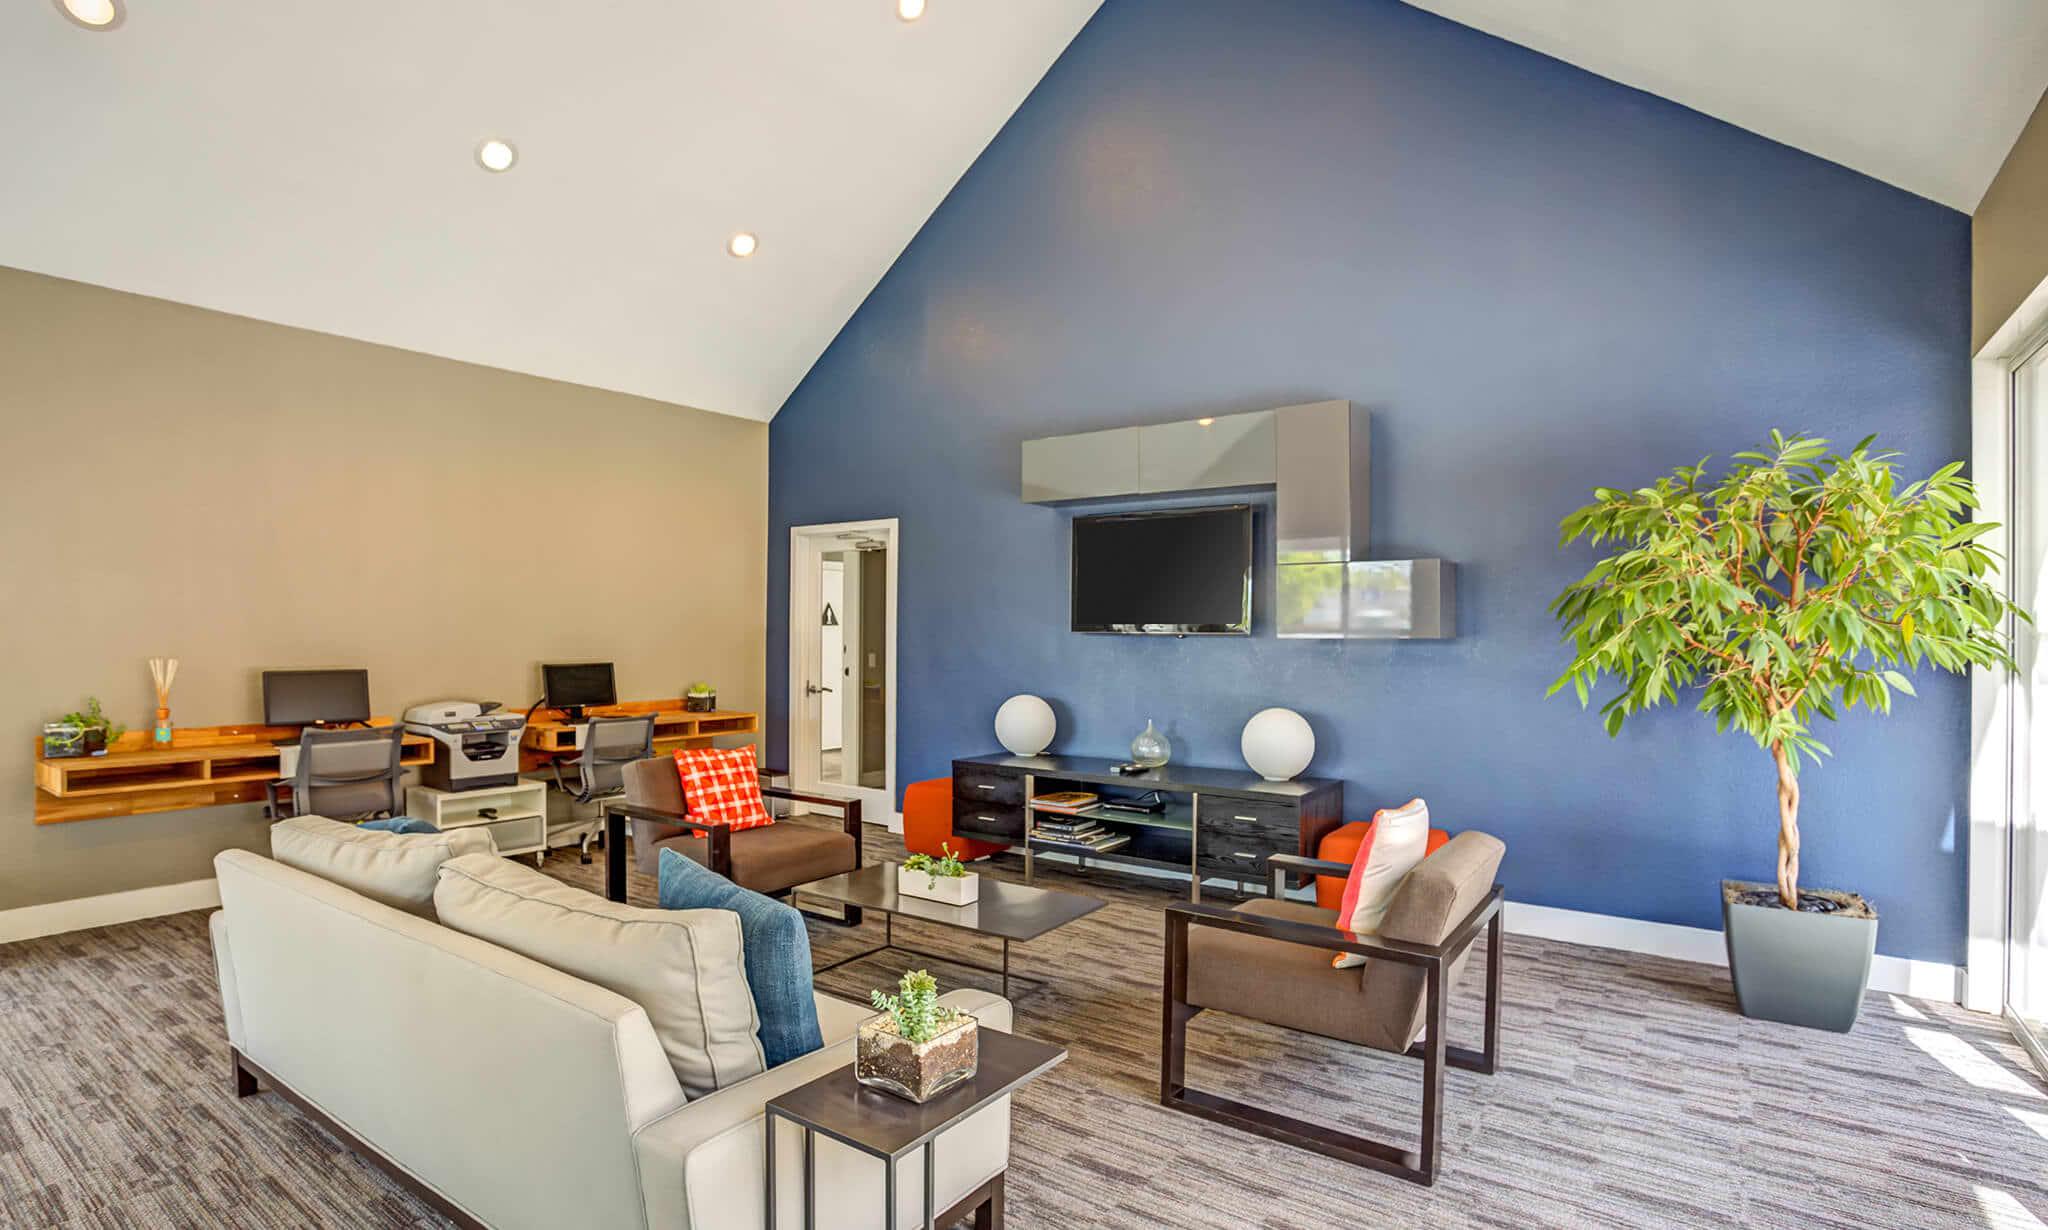 Timberleaf Apartments apartments in Santa Clara CA to rent photo 5